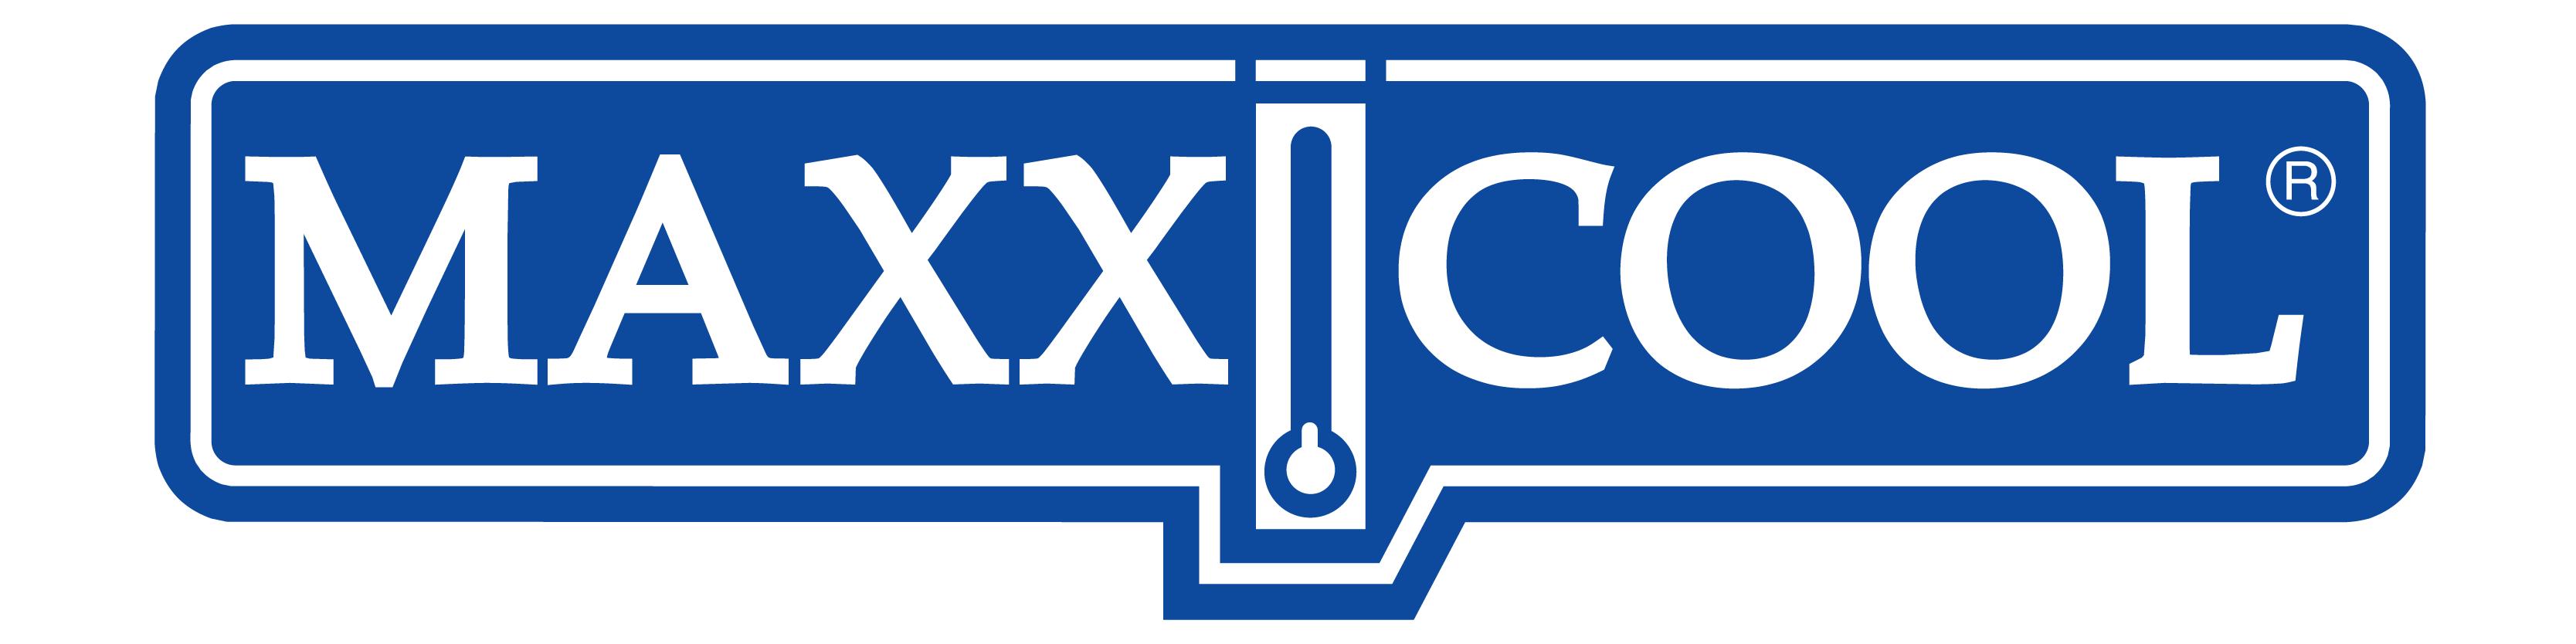 2017-ABR-4-PLEXIZ-MAC-LOGOS-ALL-MAXXICOOL